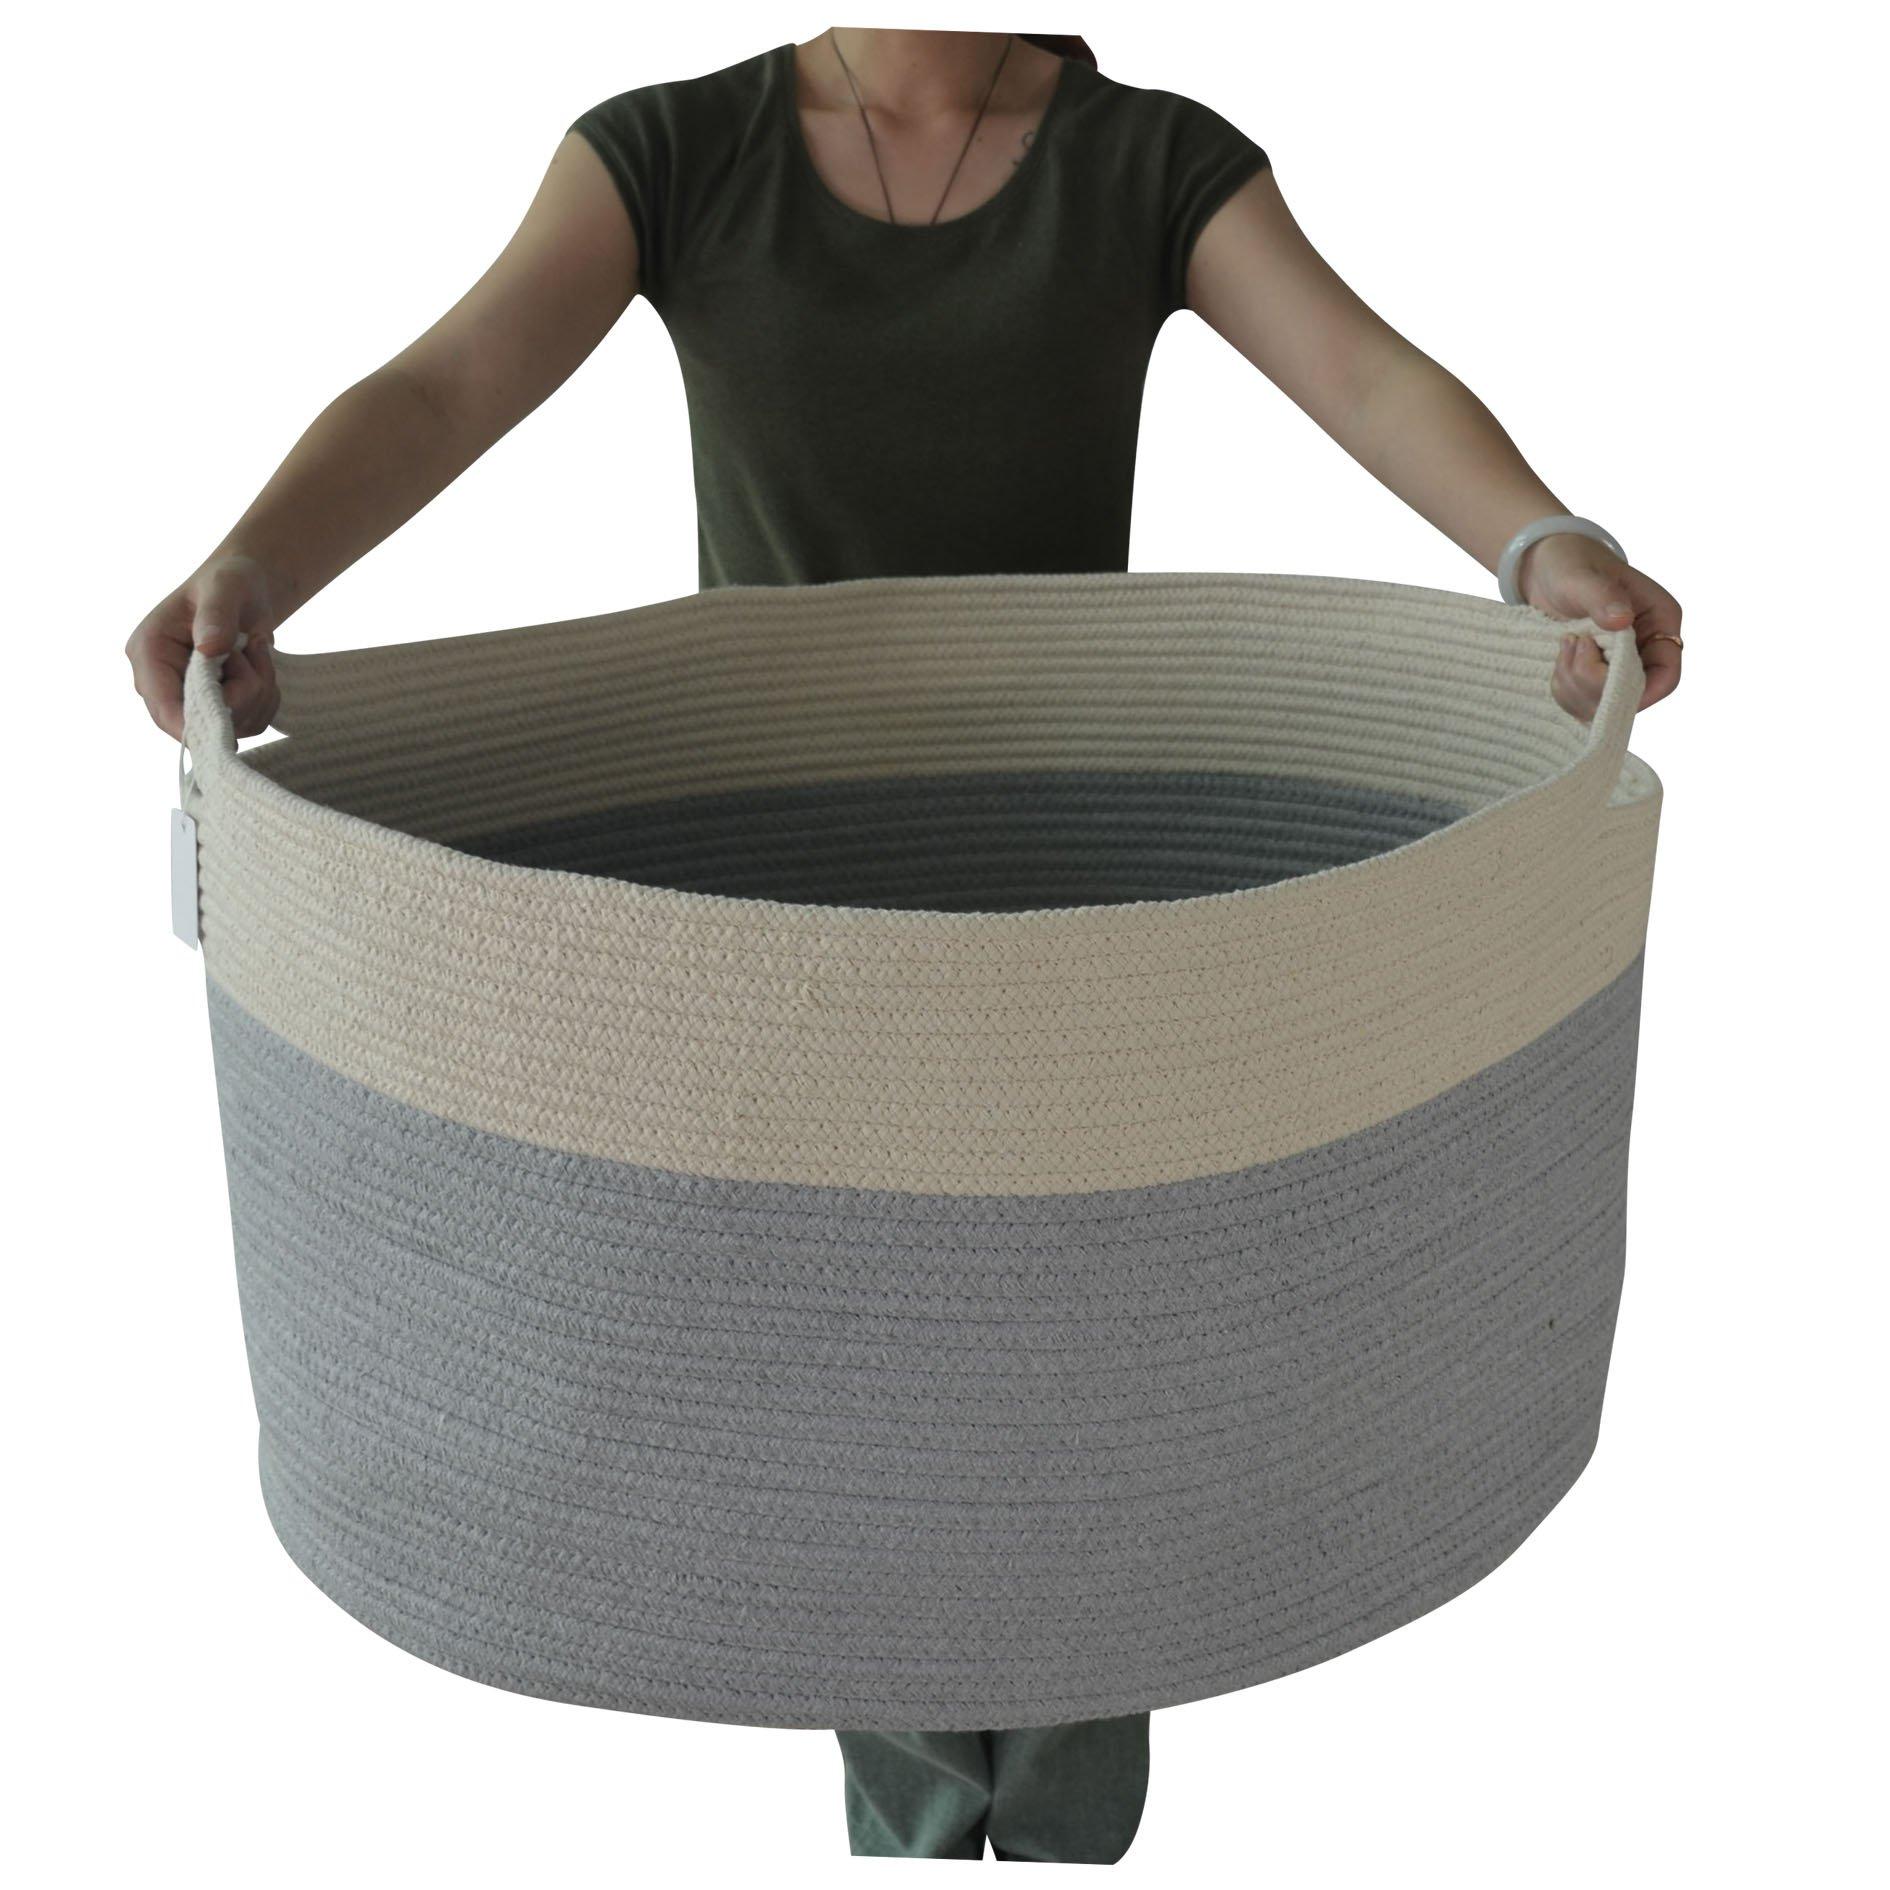 Iceblue 23.6''X17.7''X13.8'' XXXL Jumbo Toy Storage Cotton Rope Basket Hamper with Build-in Handles